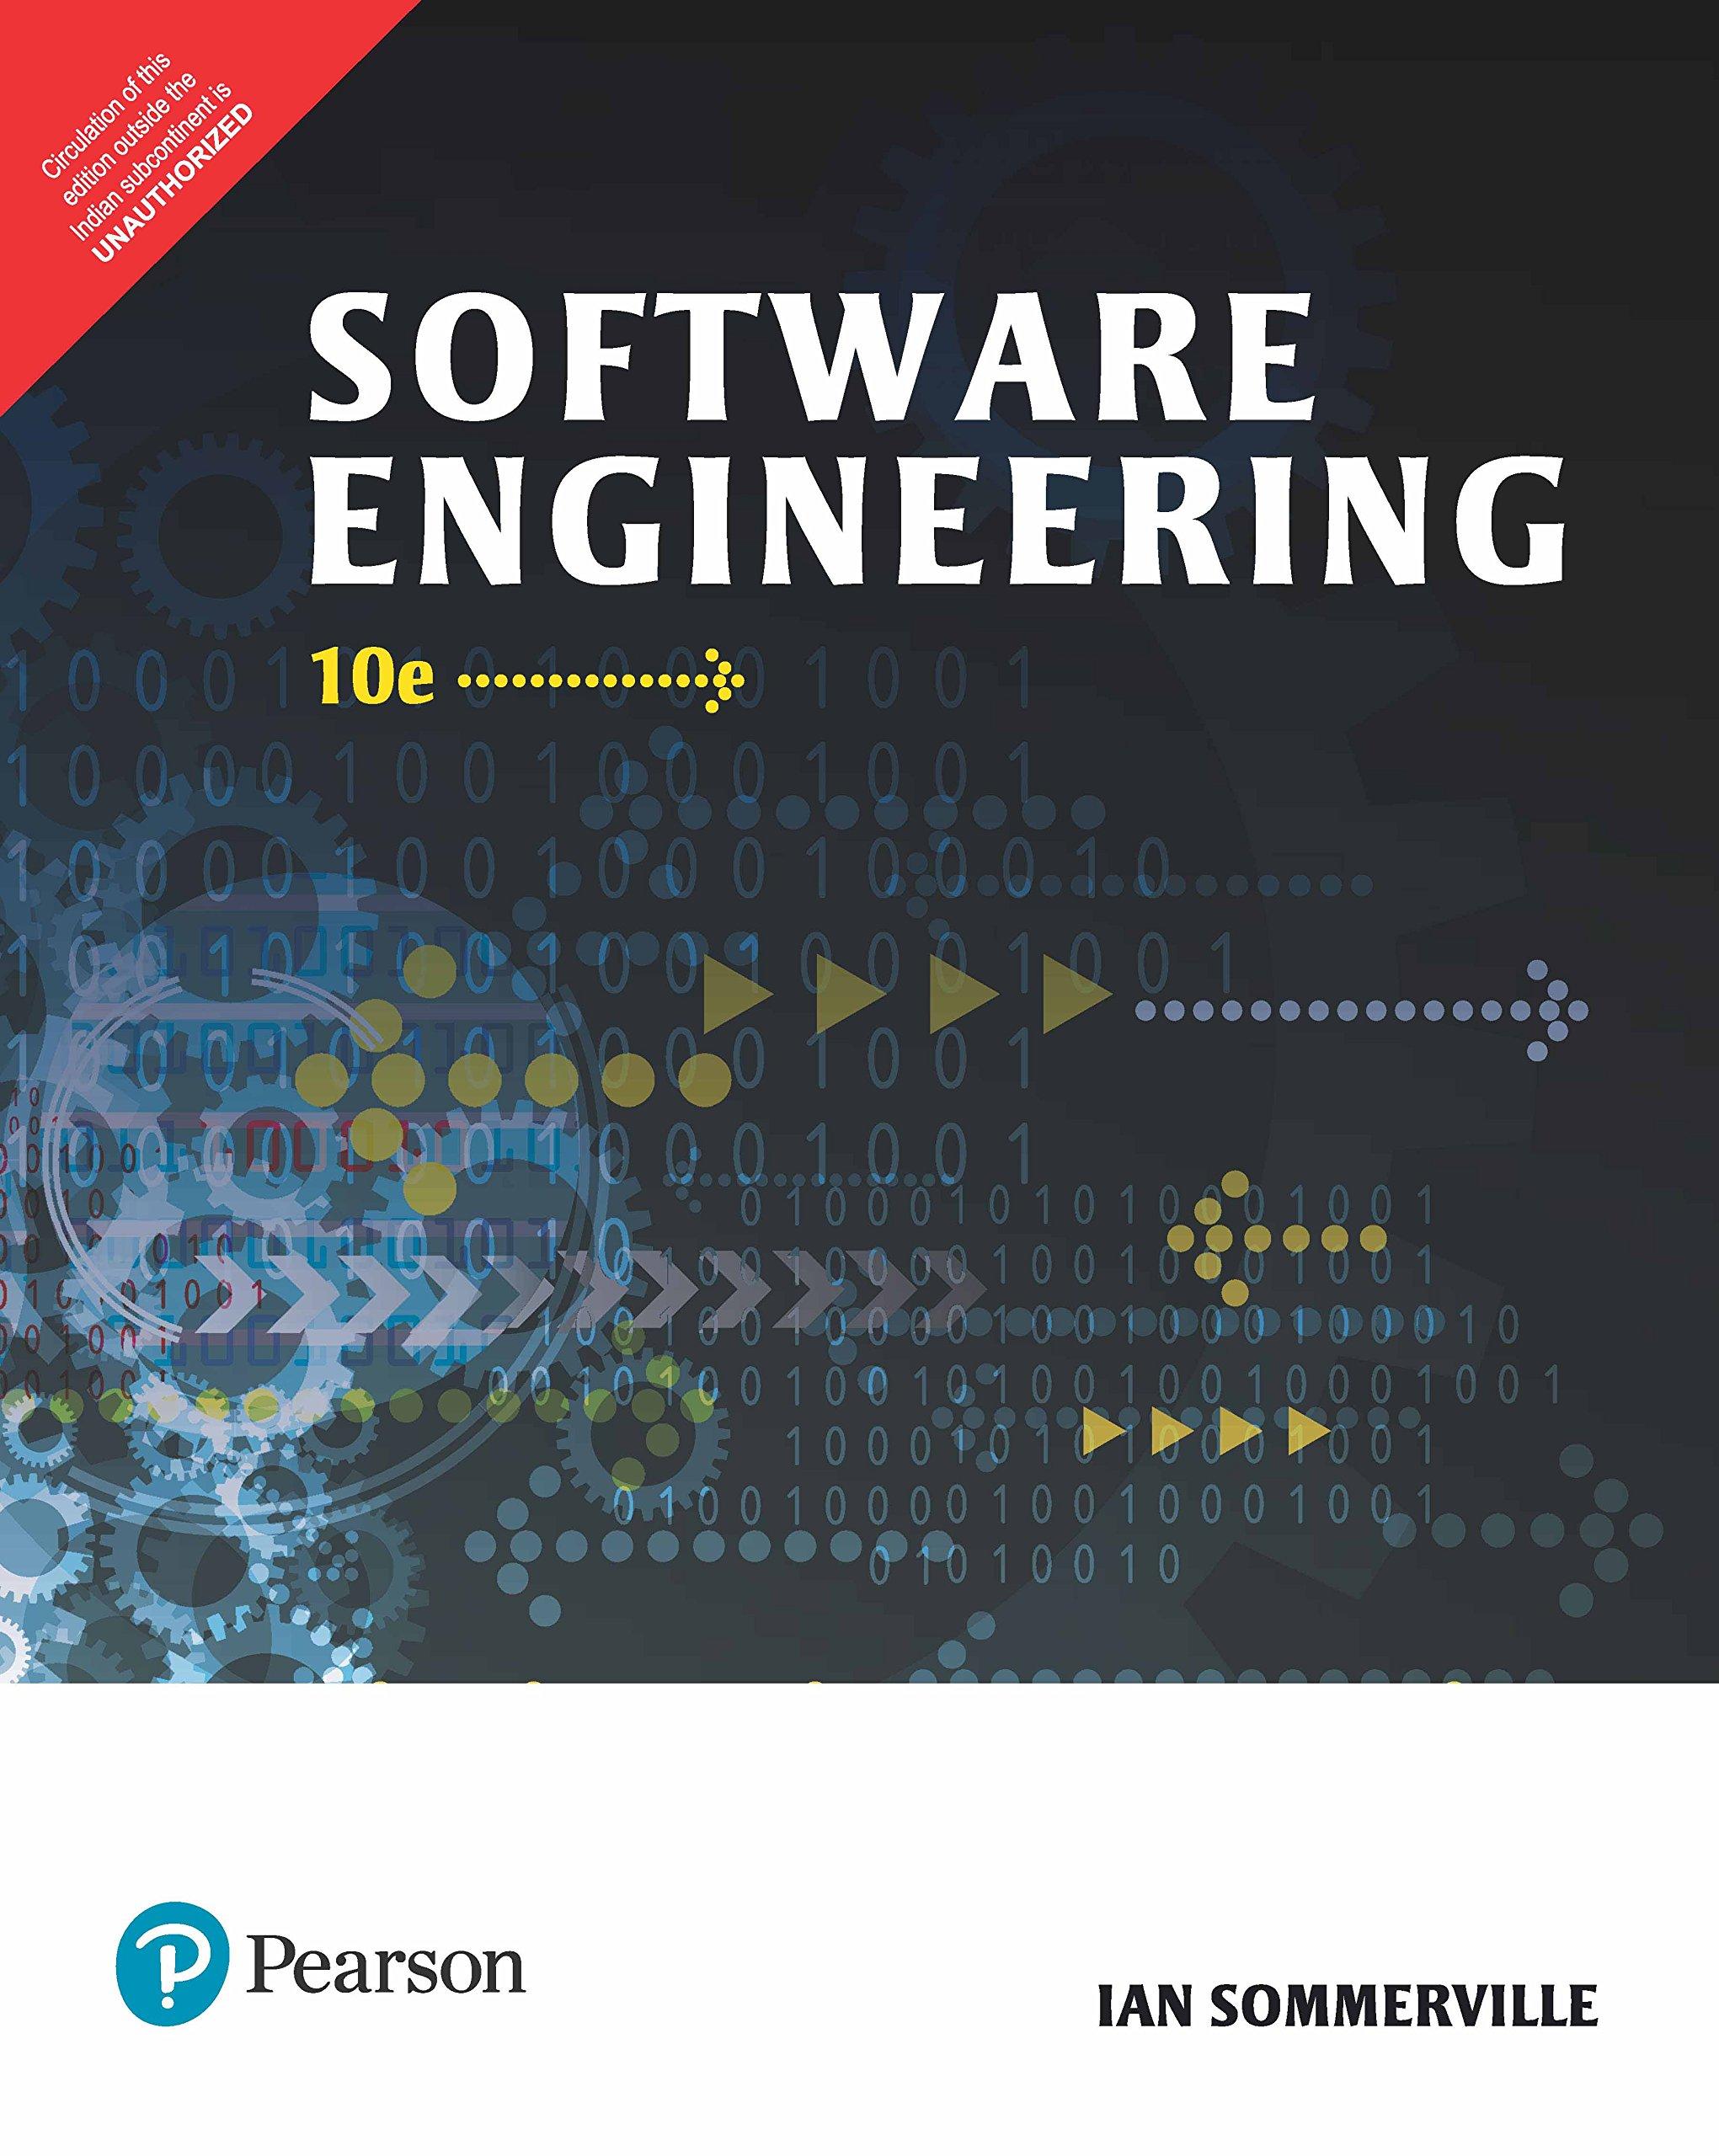 Software engineering 10th edition ian sommerville 1245454543041 software engineering 10th edition ian sommerville 1245454543041 amazon books fandeluxe Gallery